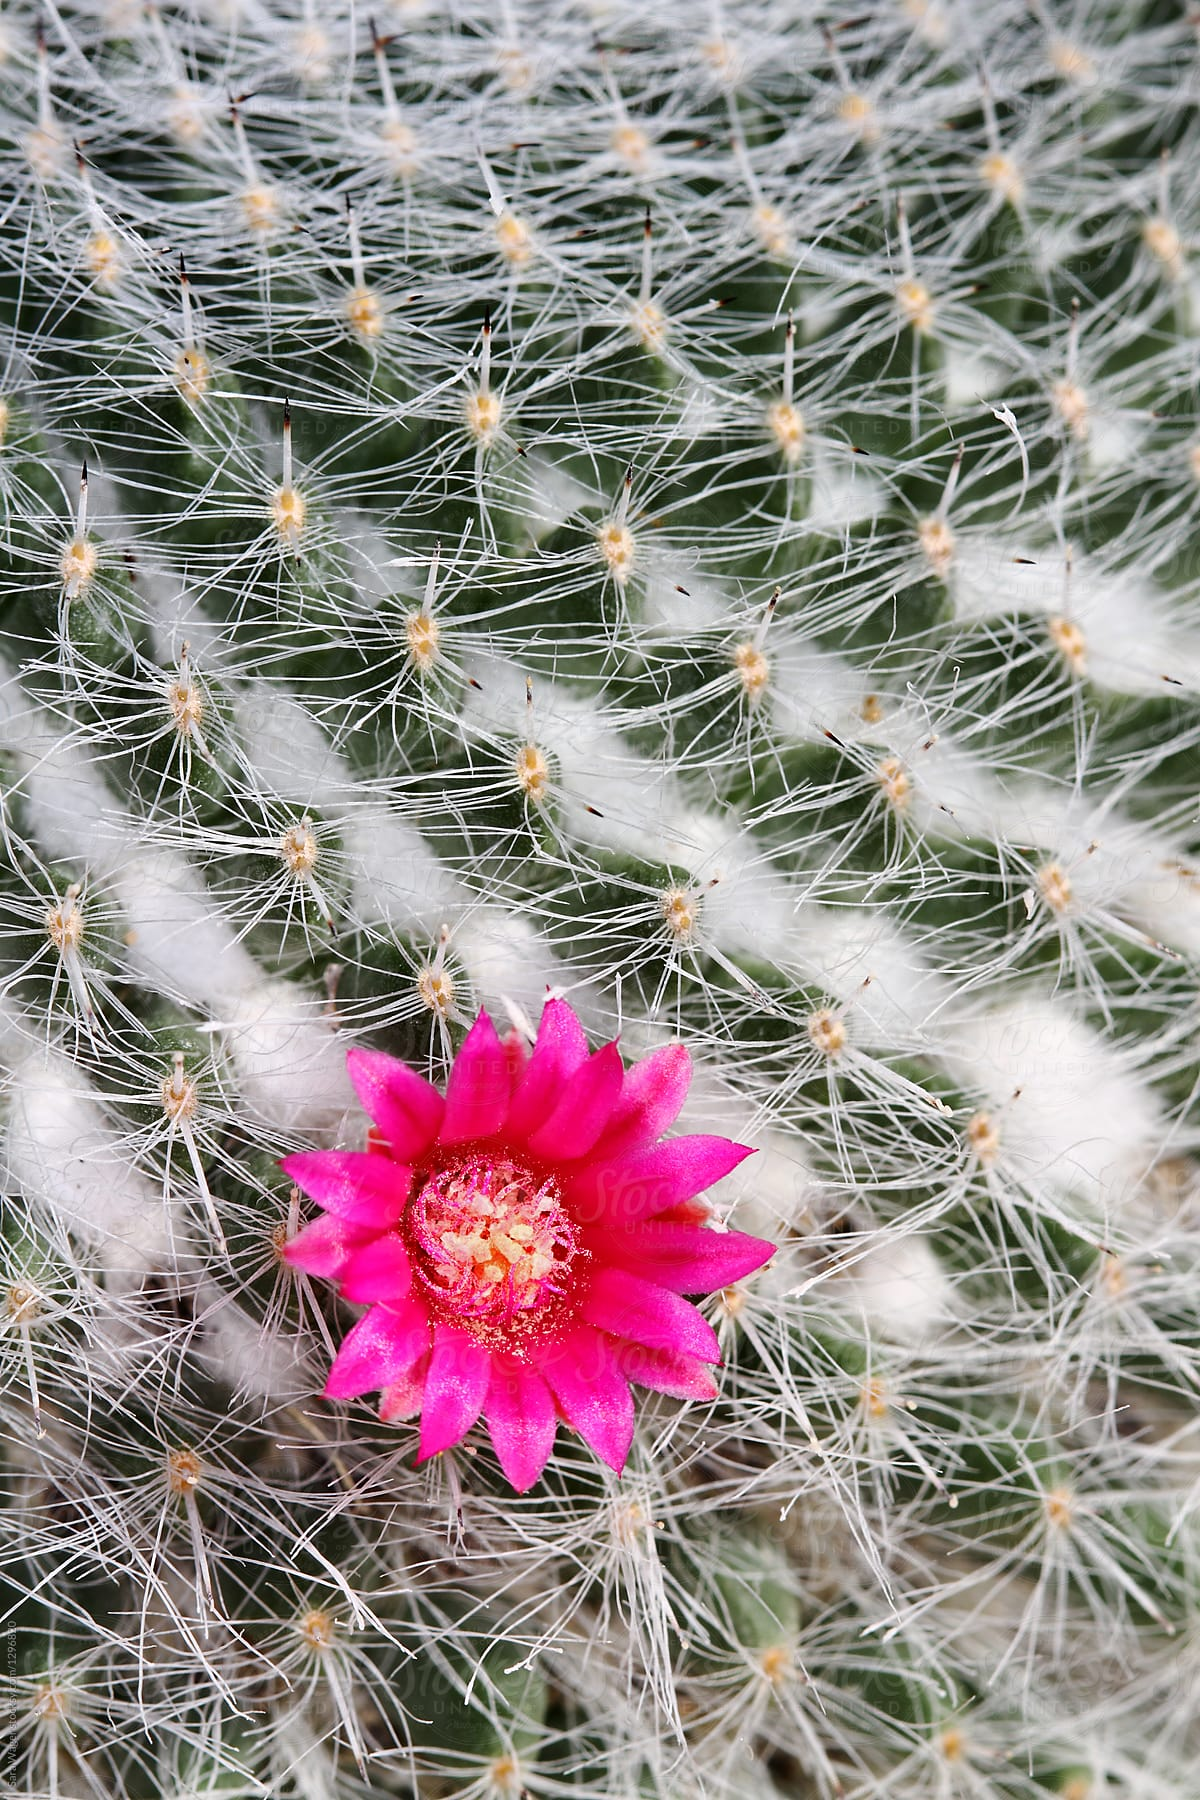 Pink Cactus Flower In Portrait Stocksy United